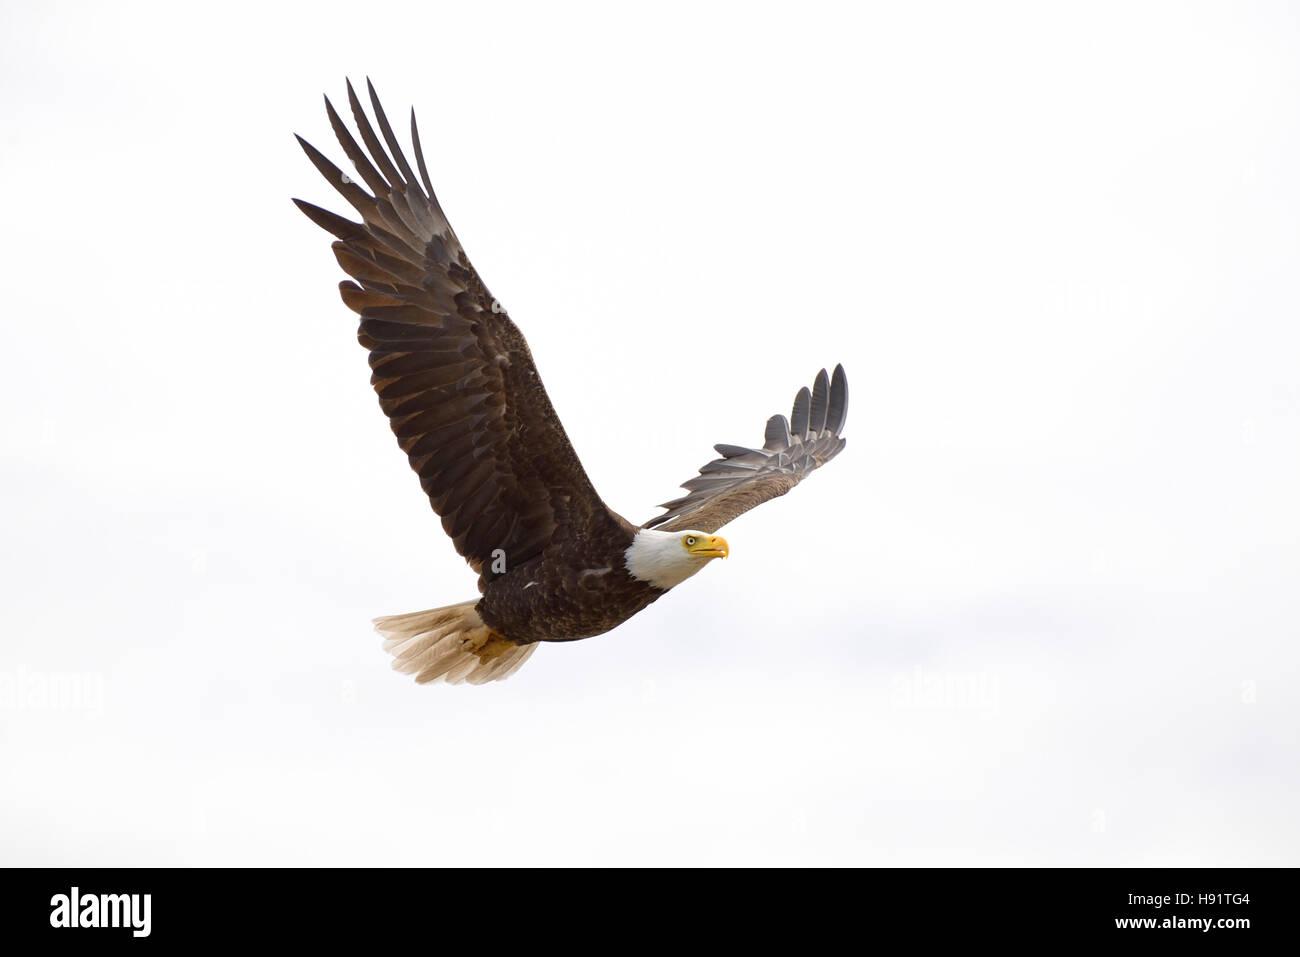 American Bald Eagle, Comox Valley, Vancouver Island, British Columbia, Canada. - Stock Image